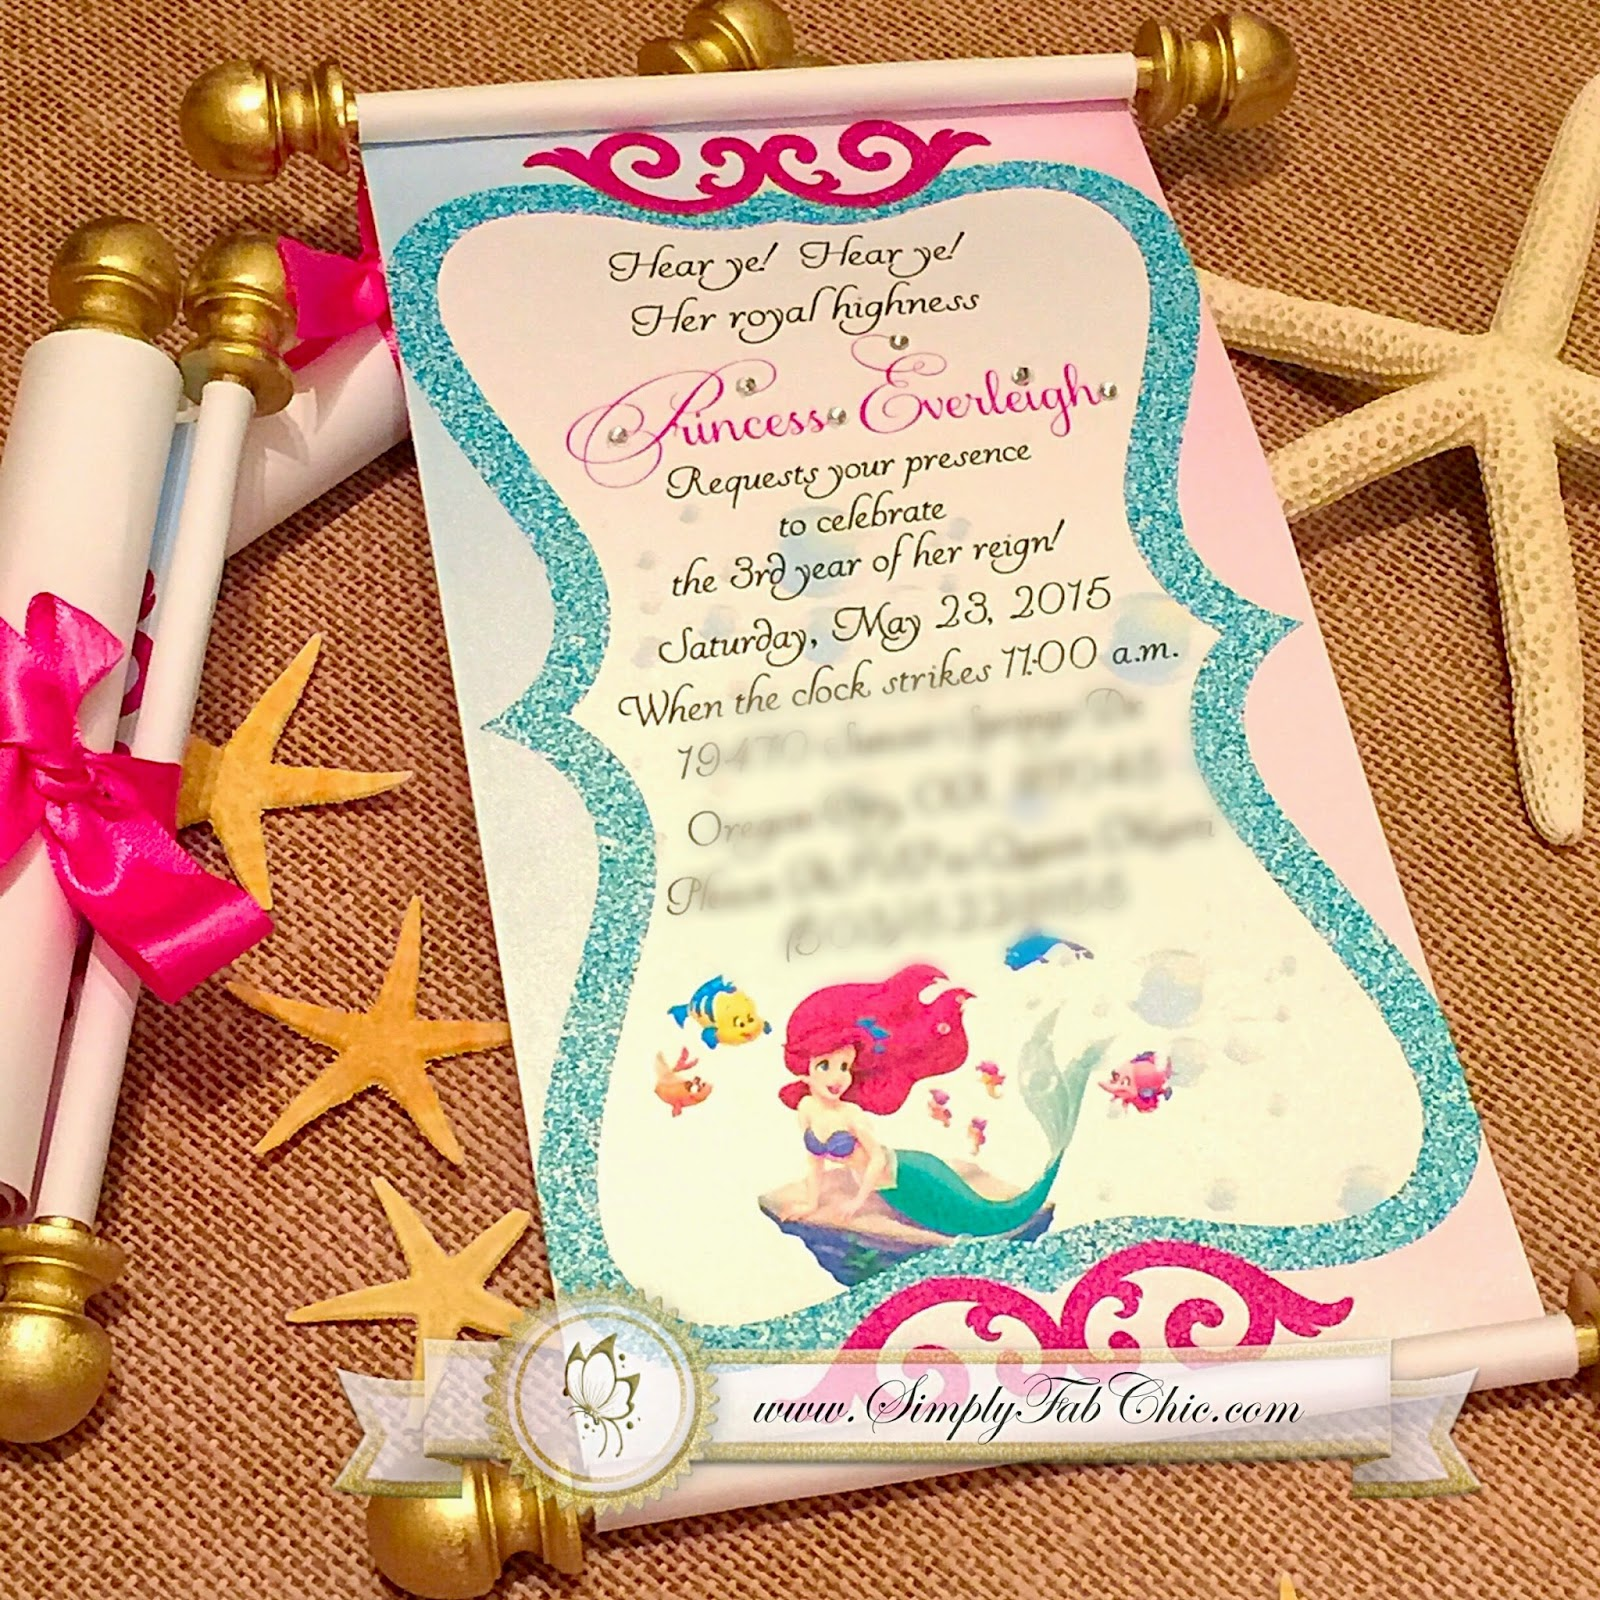 Little Mermaid Under the Sea Royal Princess | Simply Fab & Chic